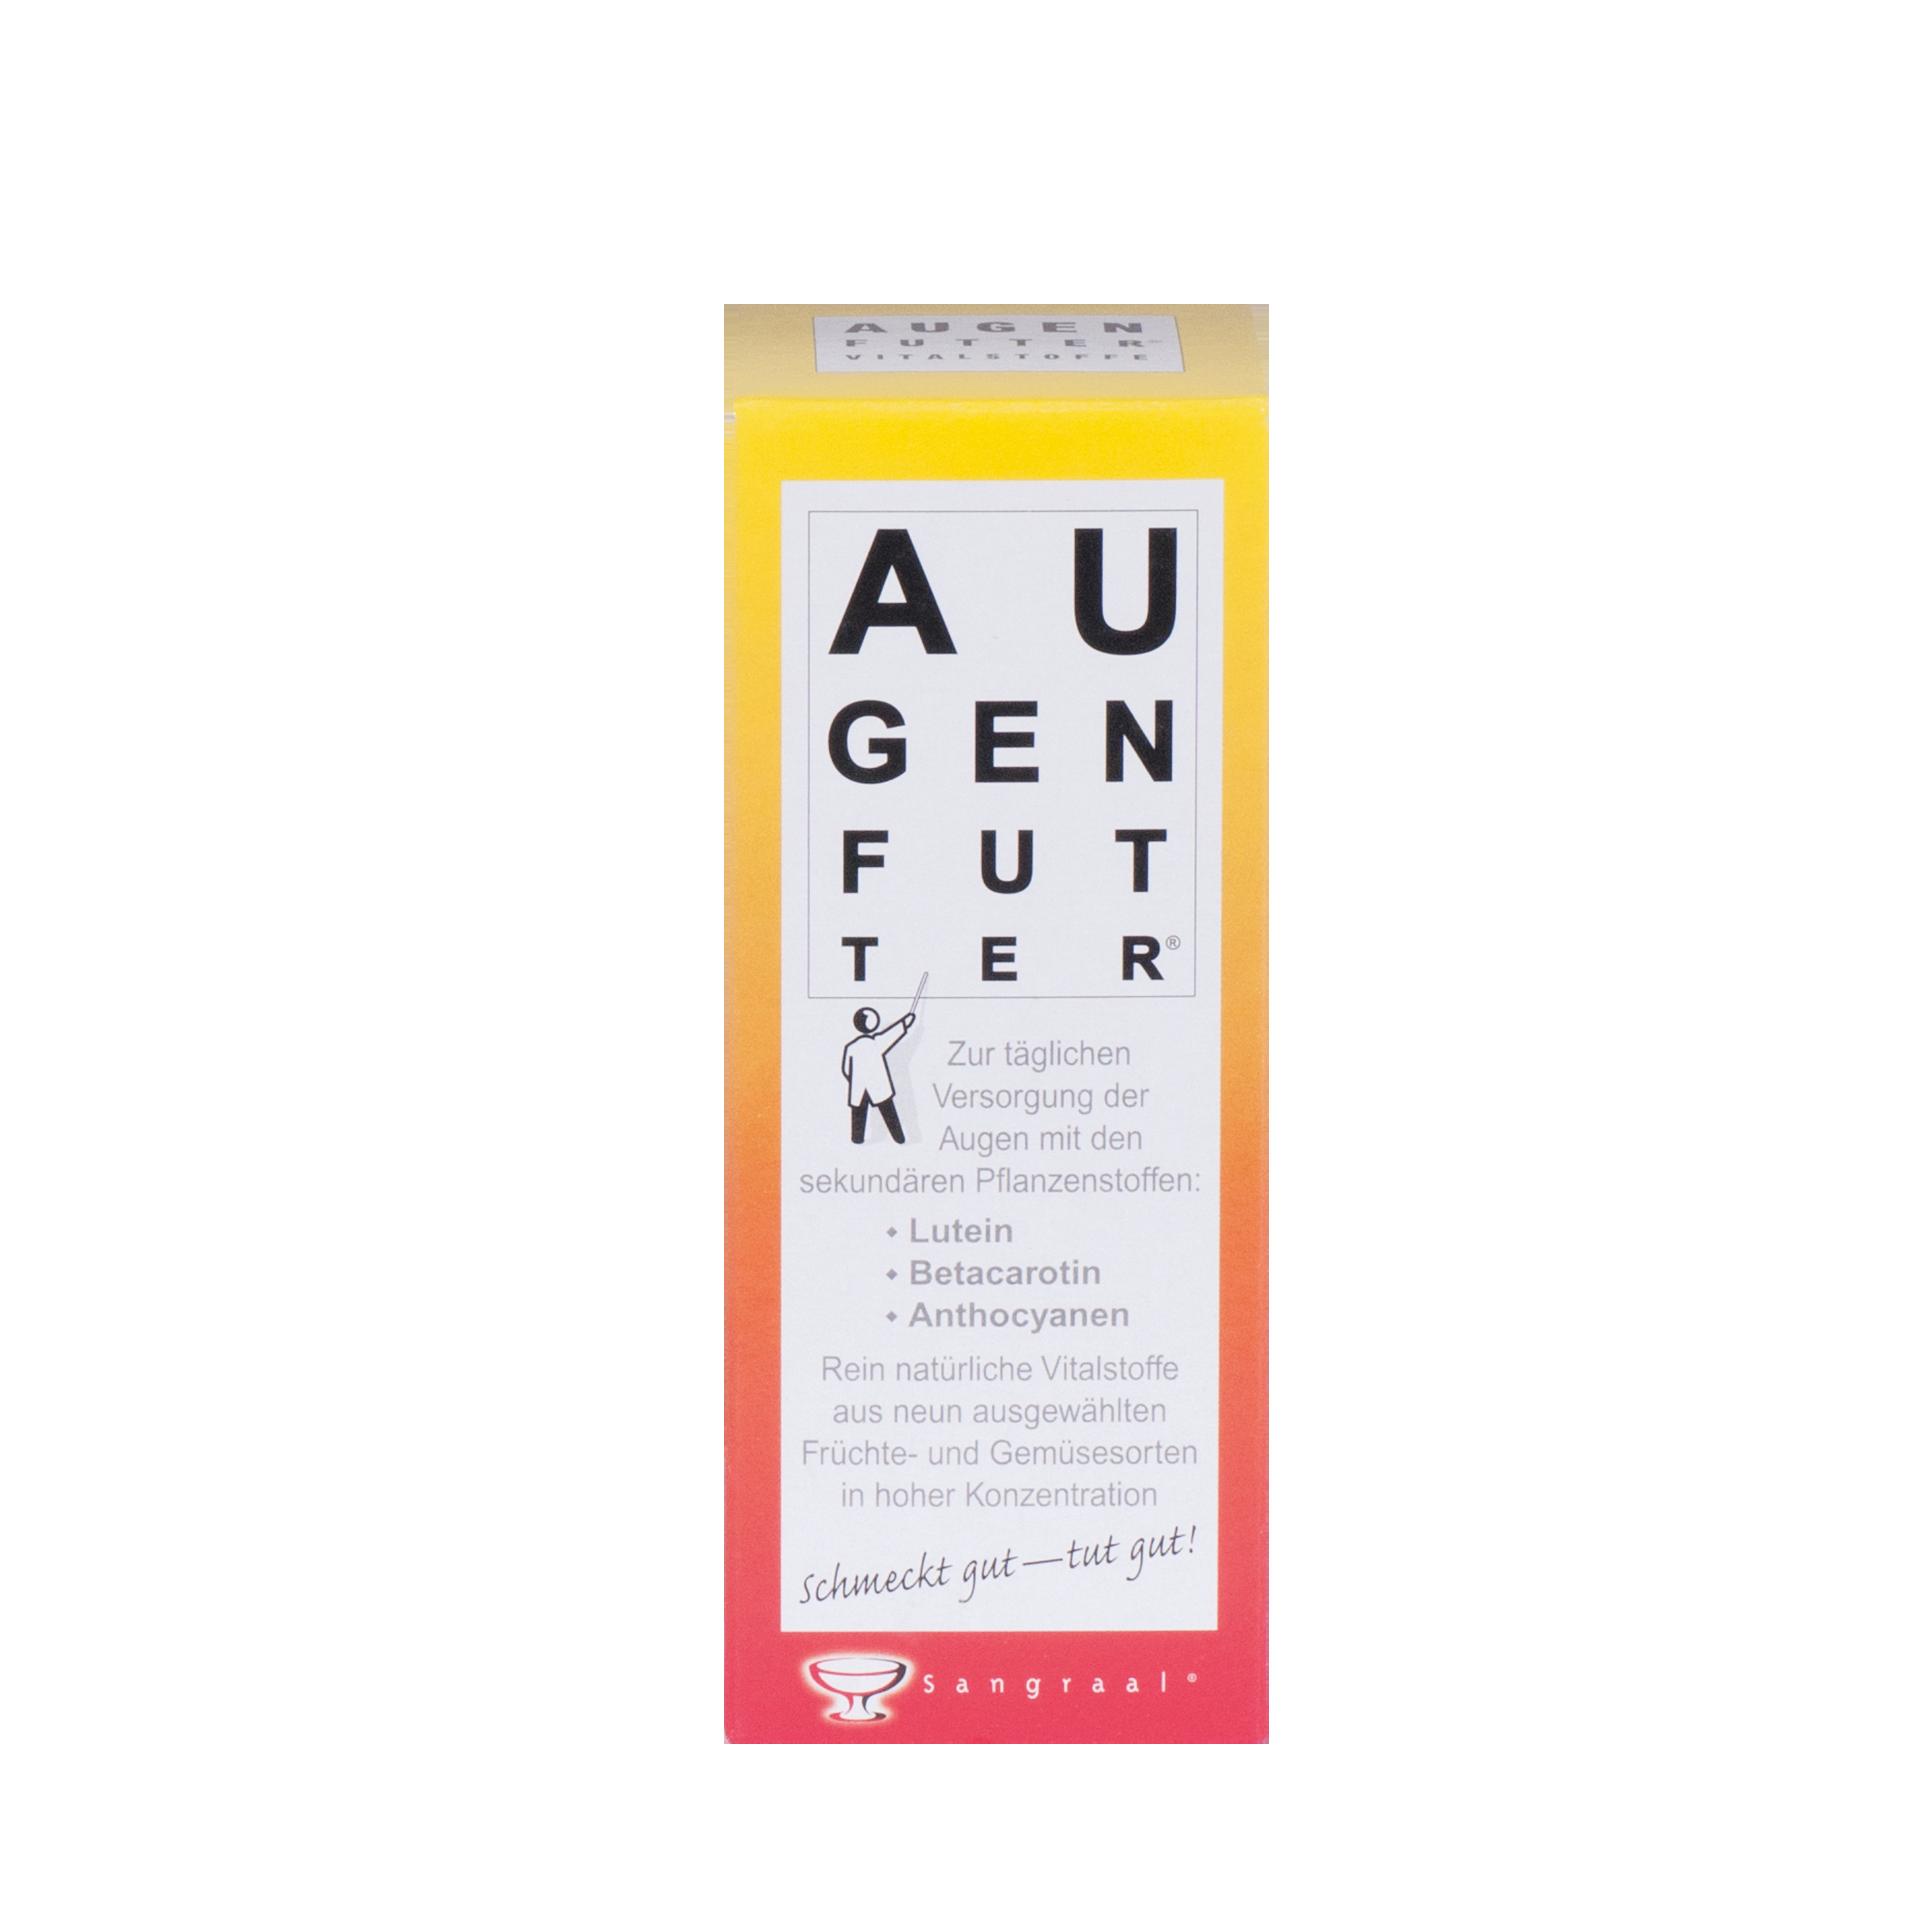 Augenfutter, 100 ml, ohne Alkohol